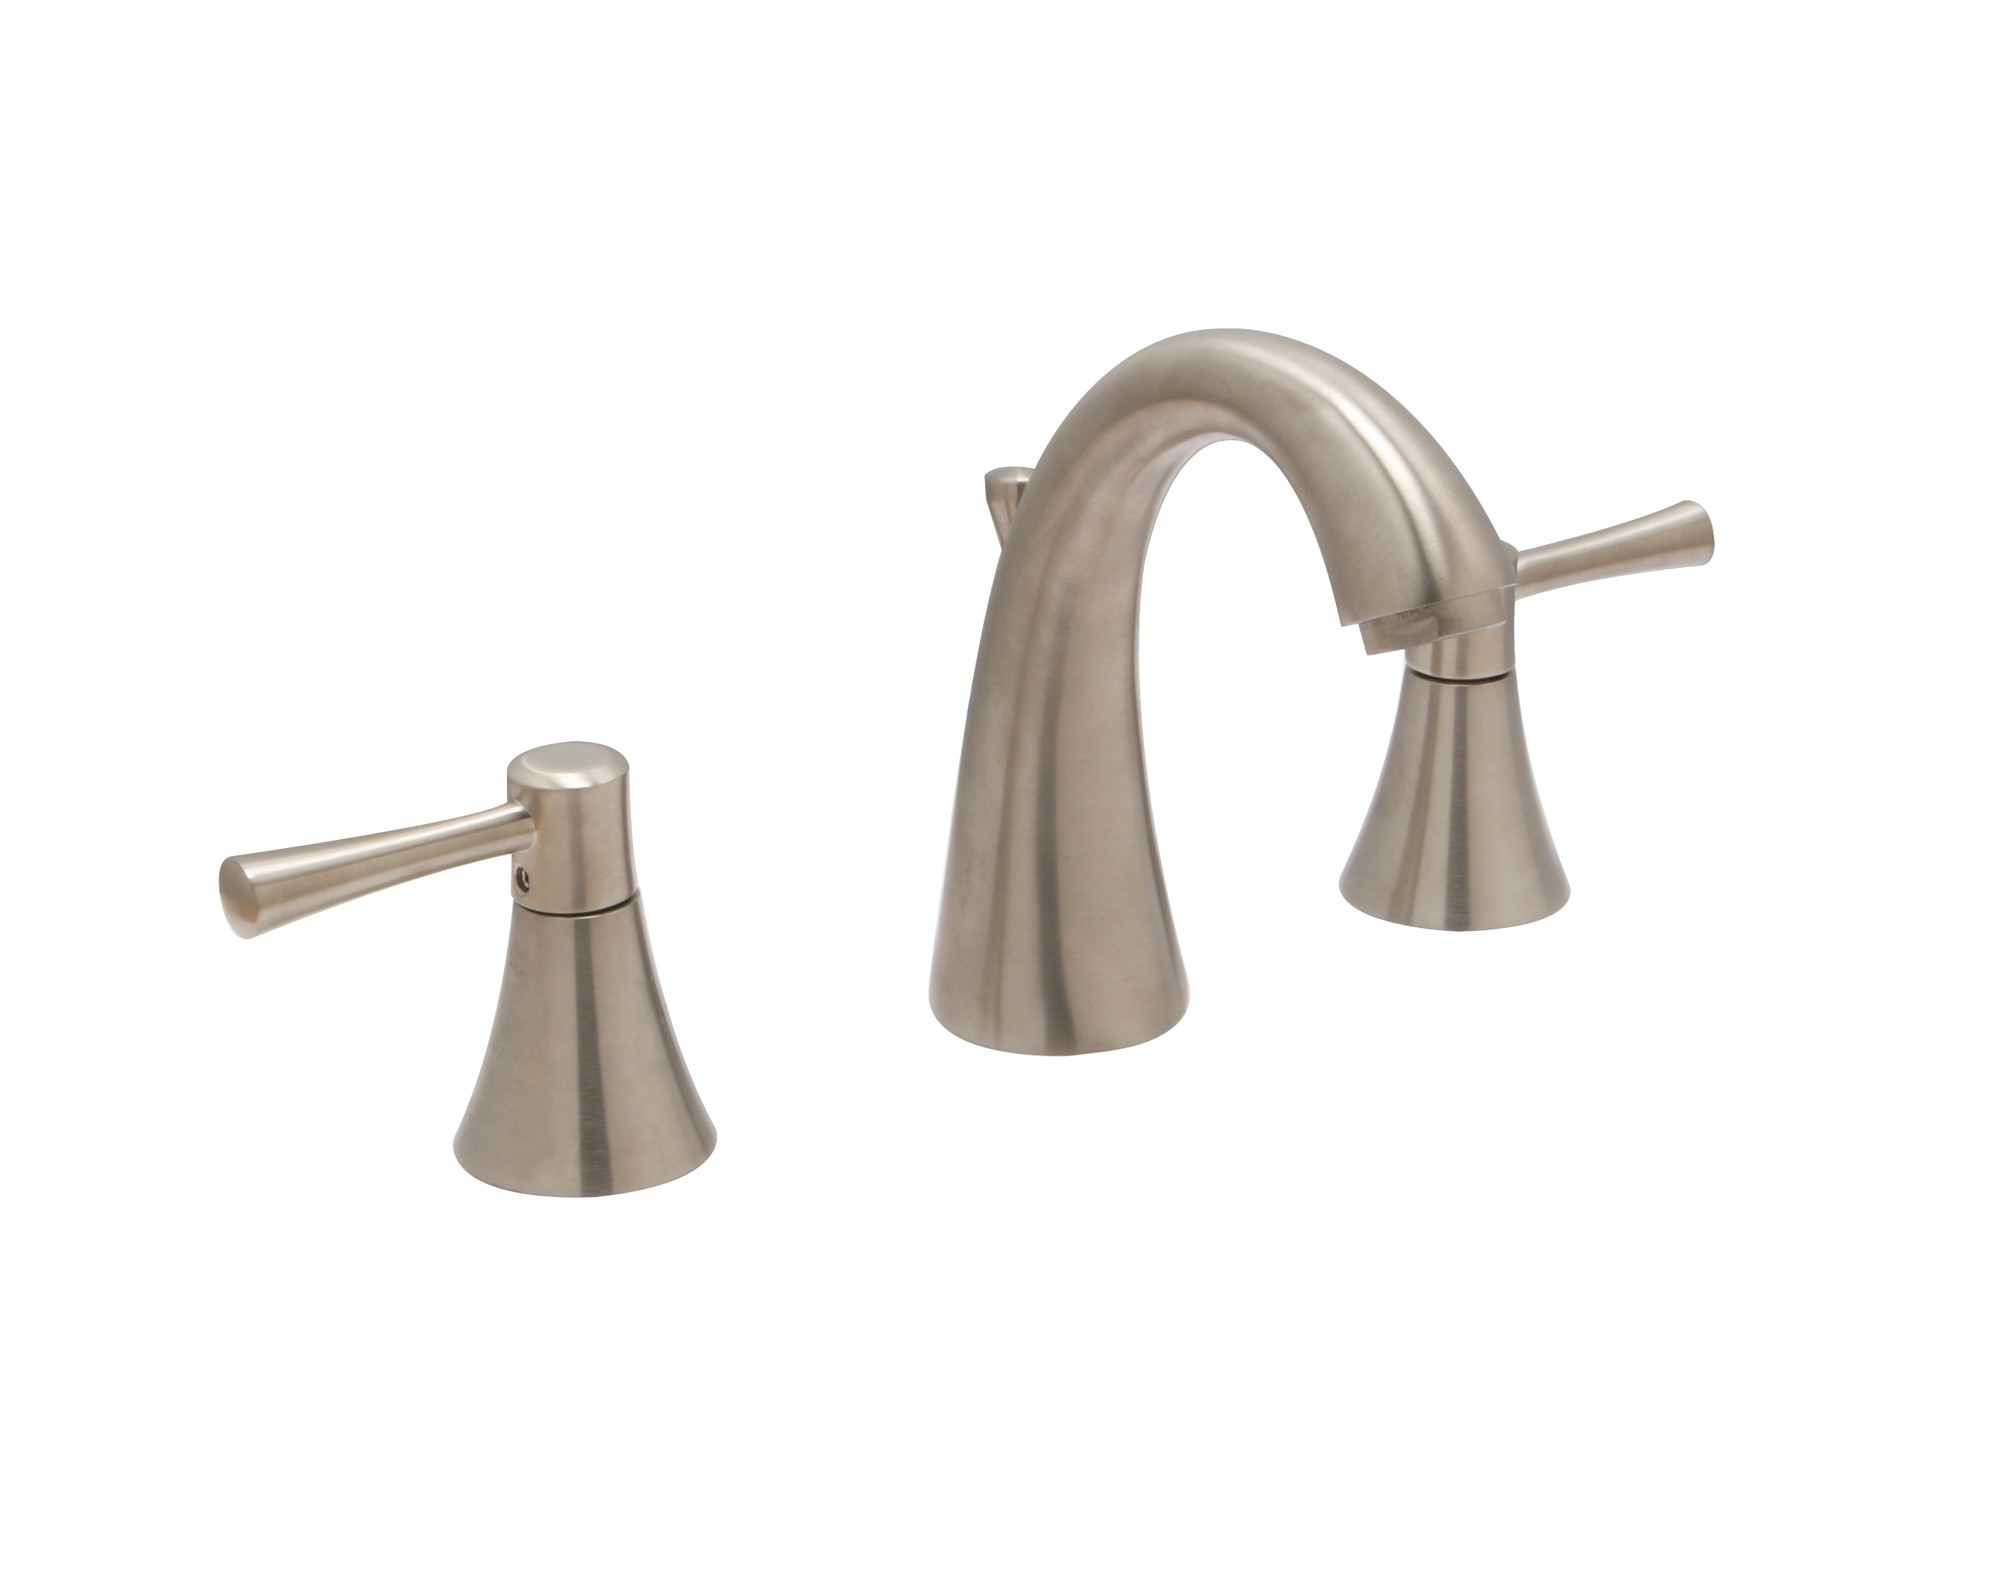 Carmel Widespread Faucet W4520102-1